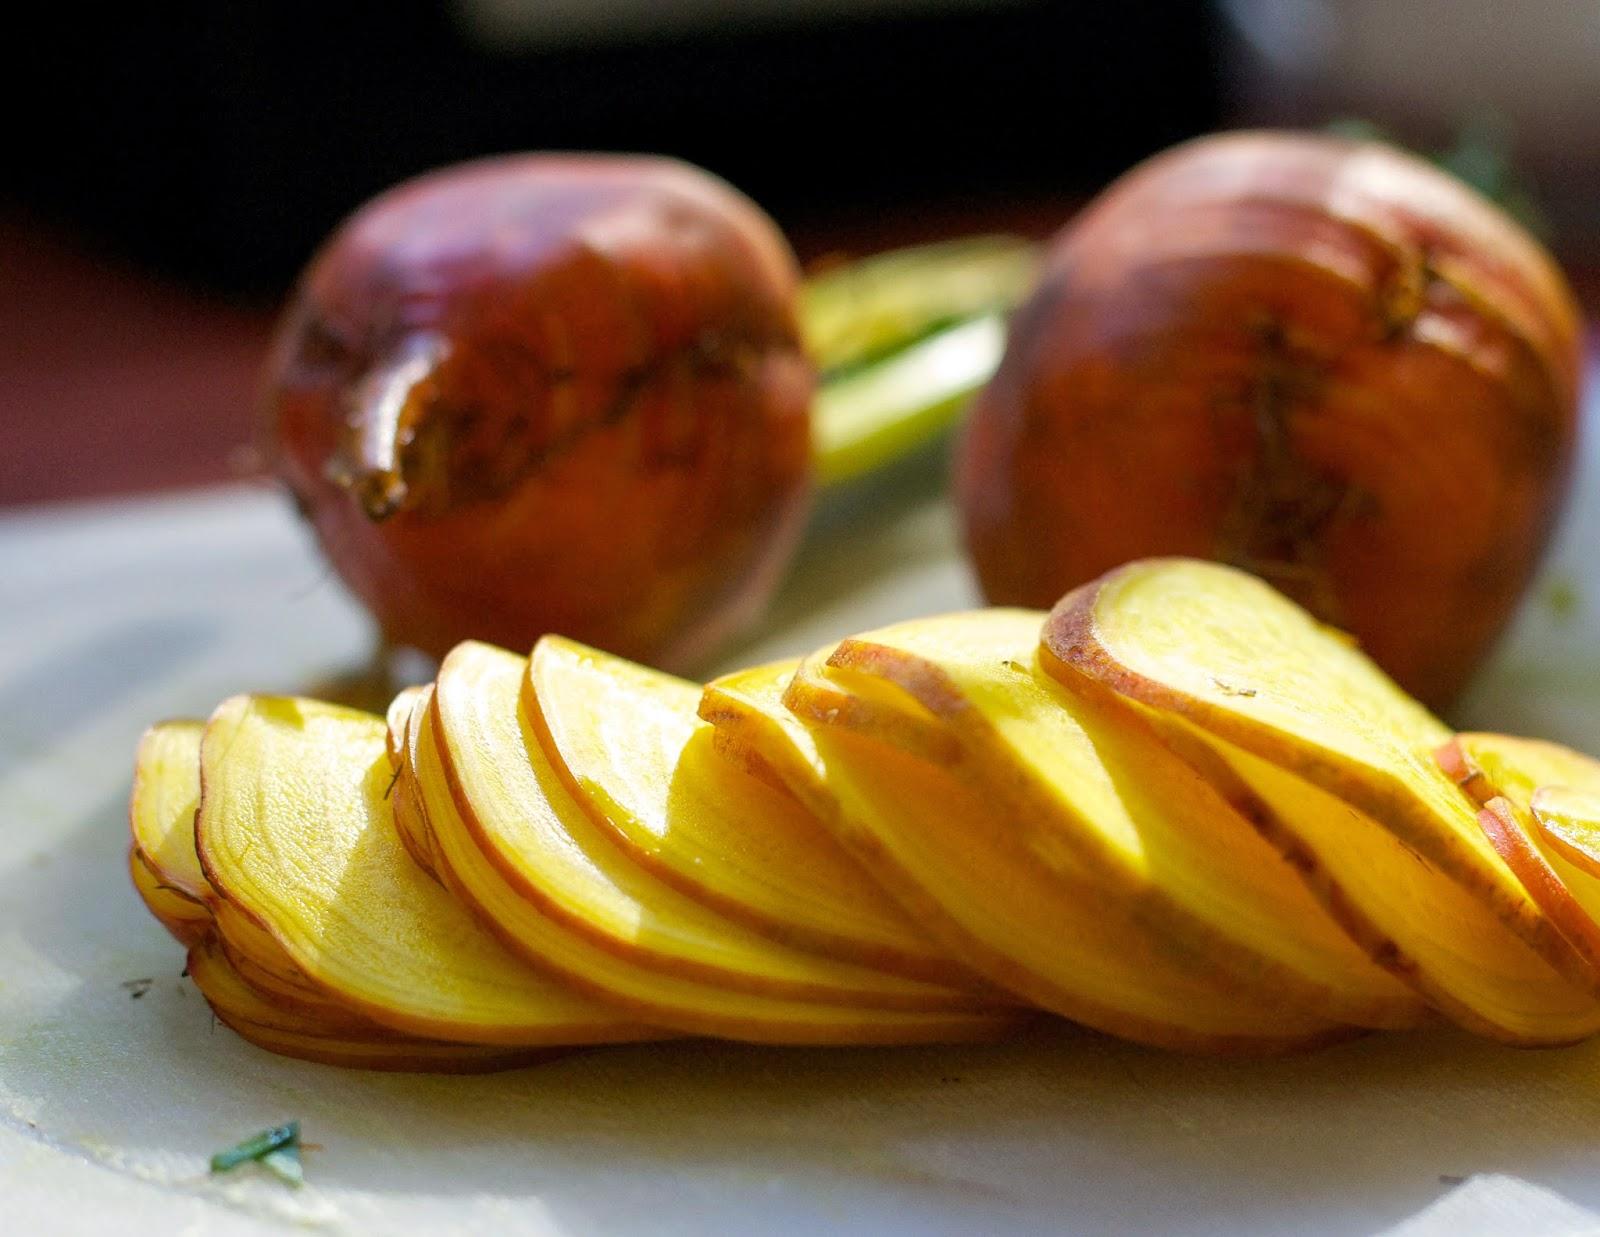 beets, raw, health, detox, anti-inflammatory